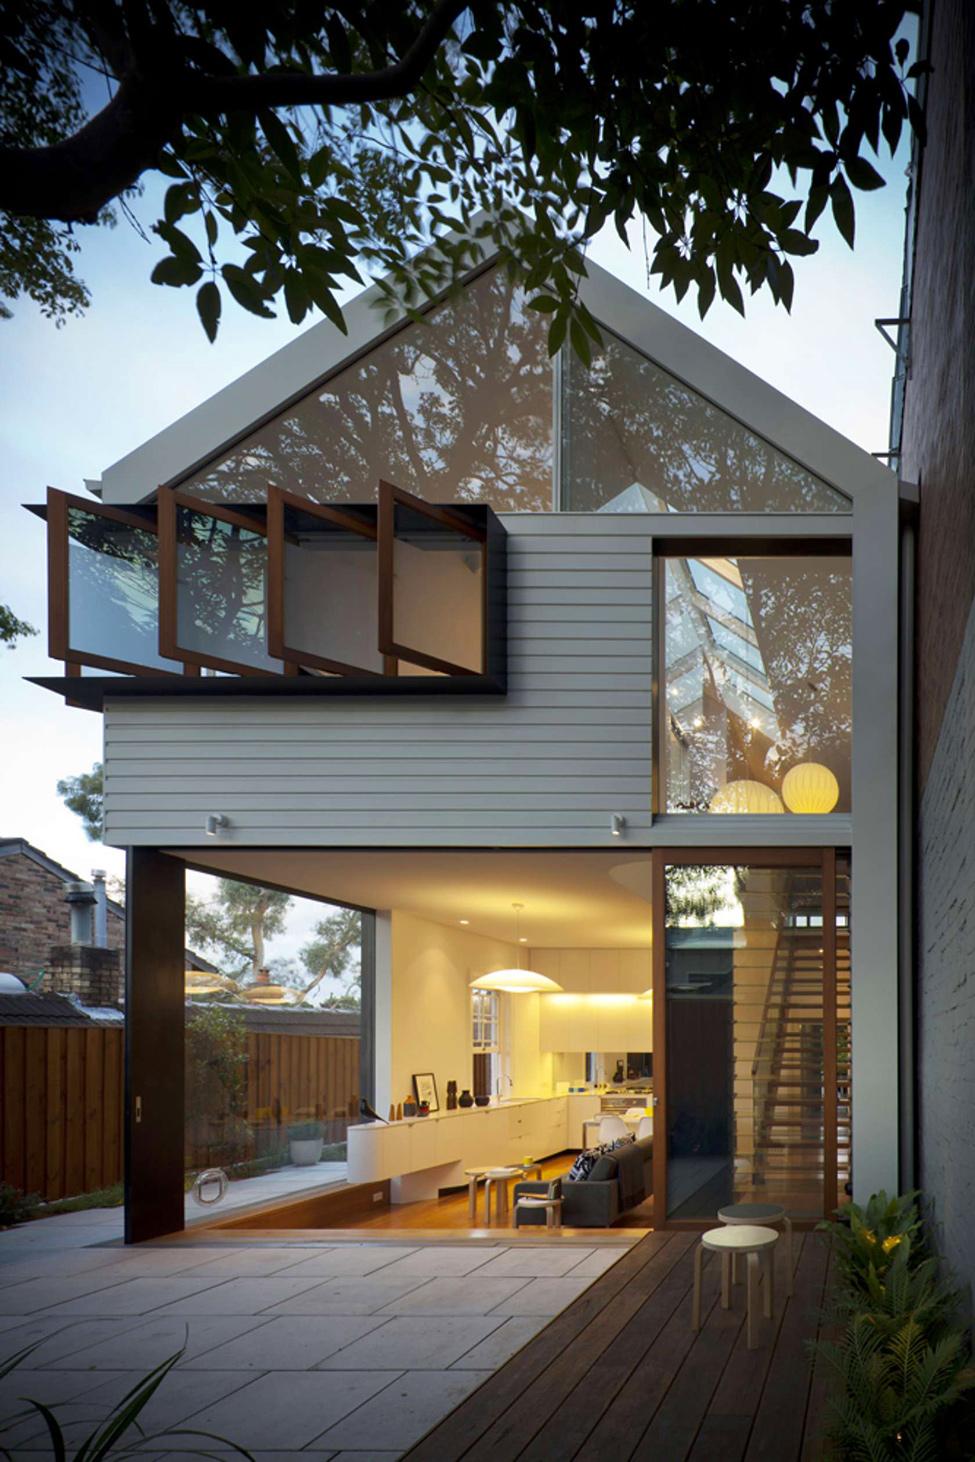 Tradtional-Modern-House-Concept-of-Elliott-Ripper-House